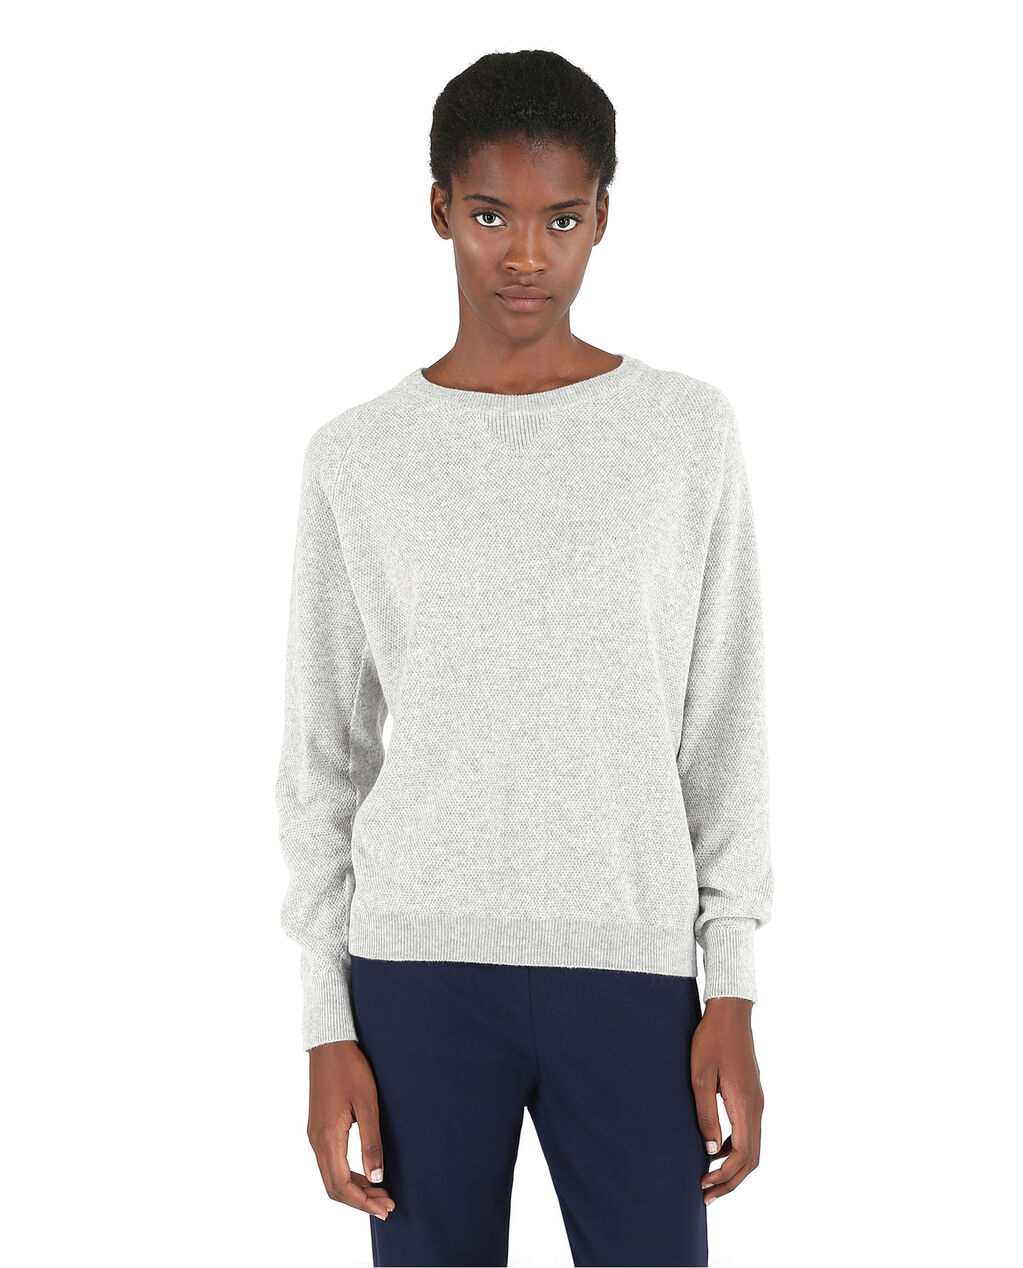 W'S Cashmere Stitches Sweater